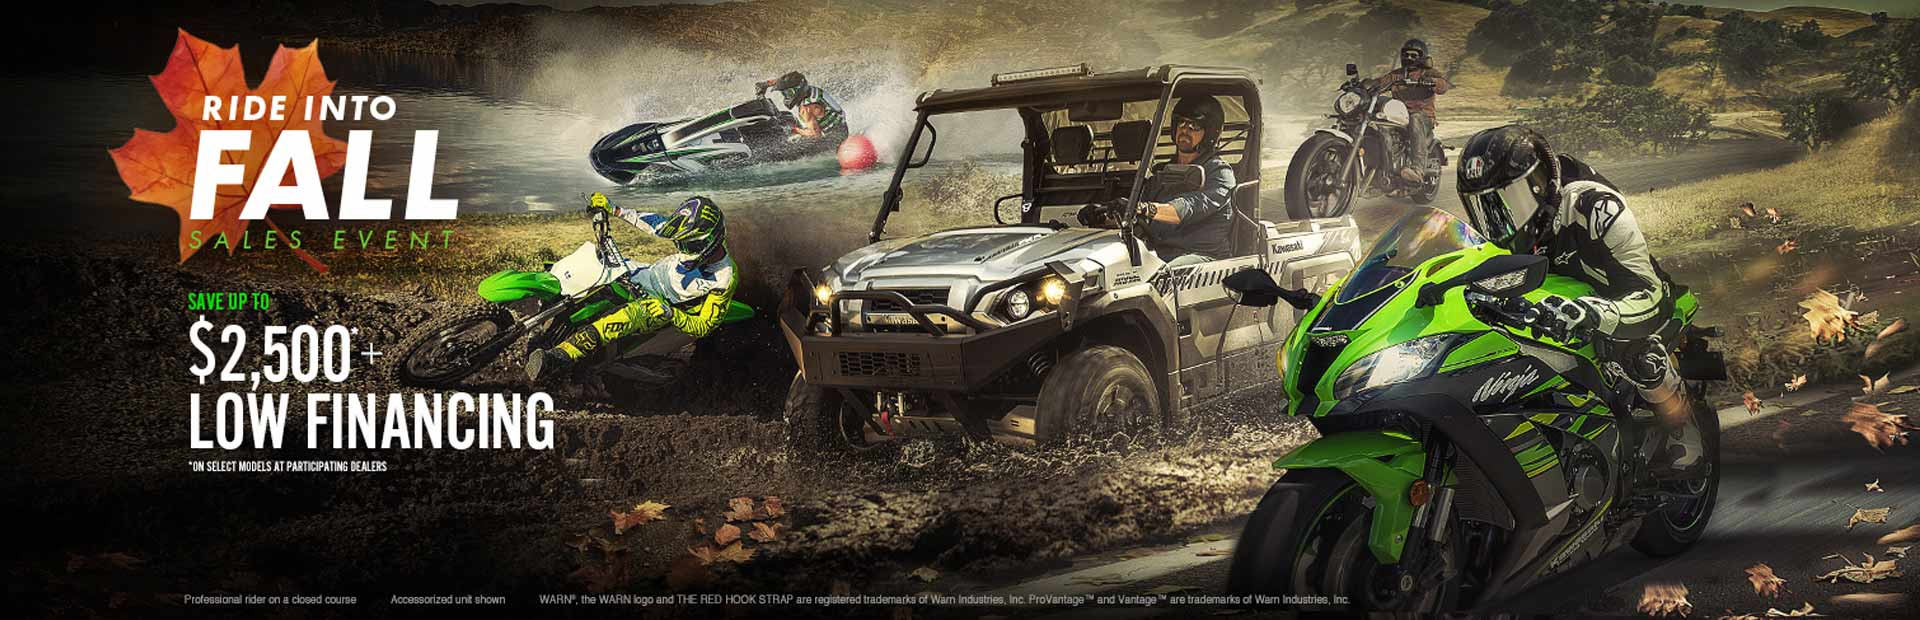 home sportland motorsports urbana, il (217) 328-5005